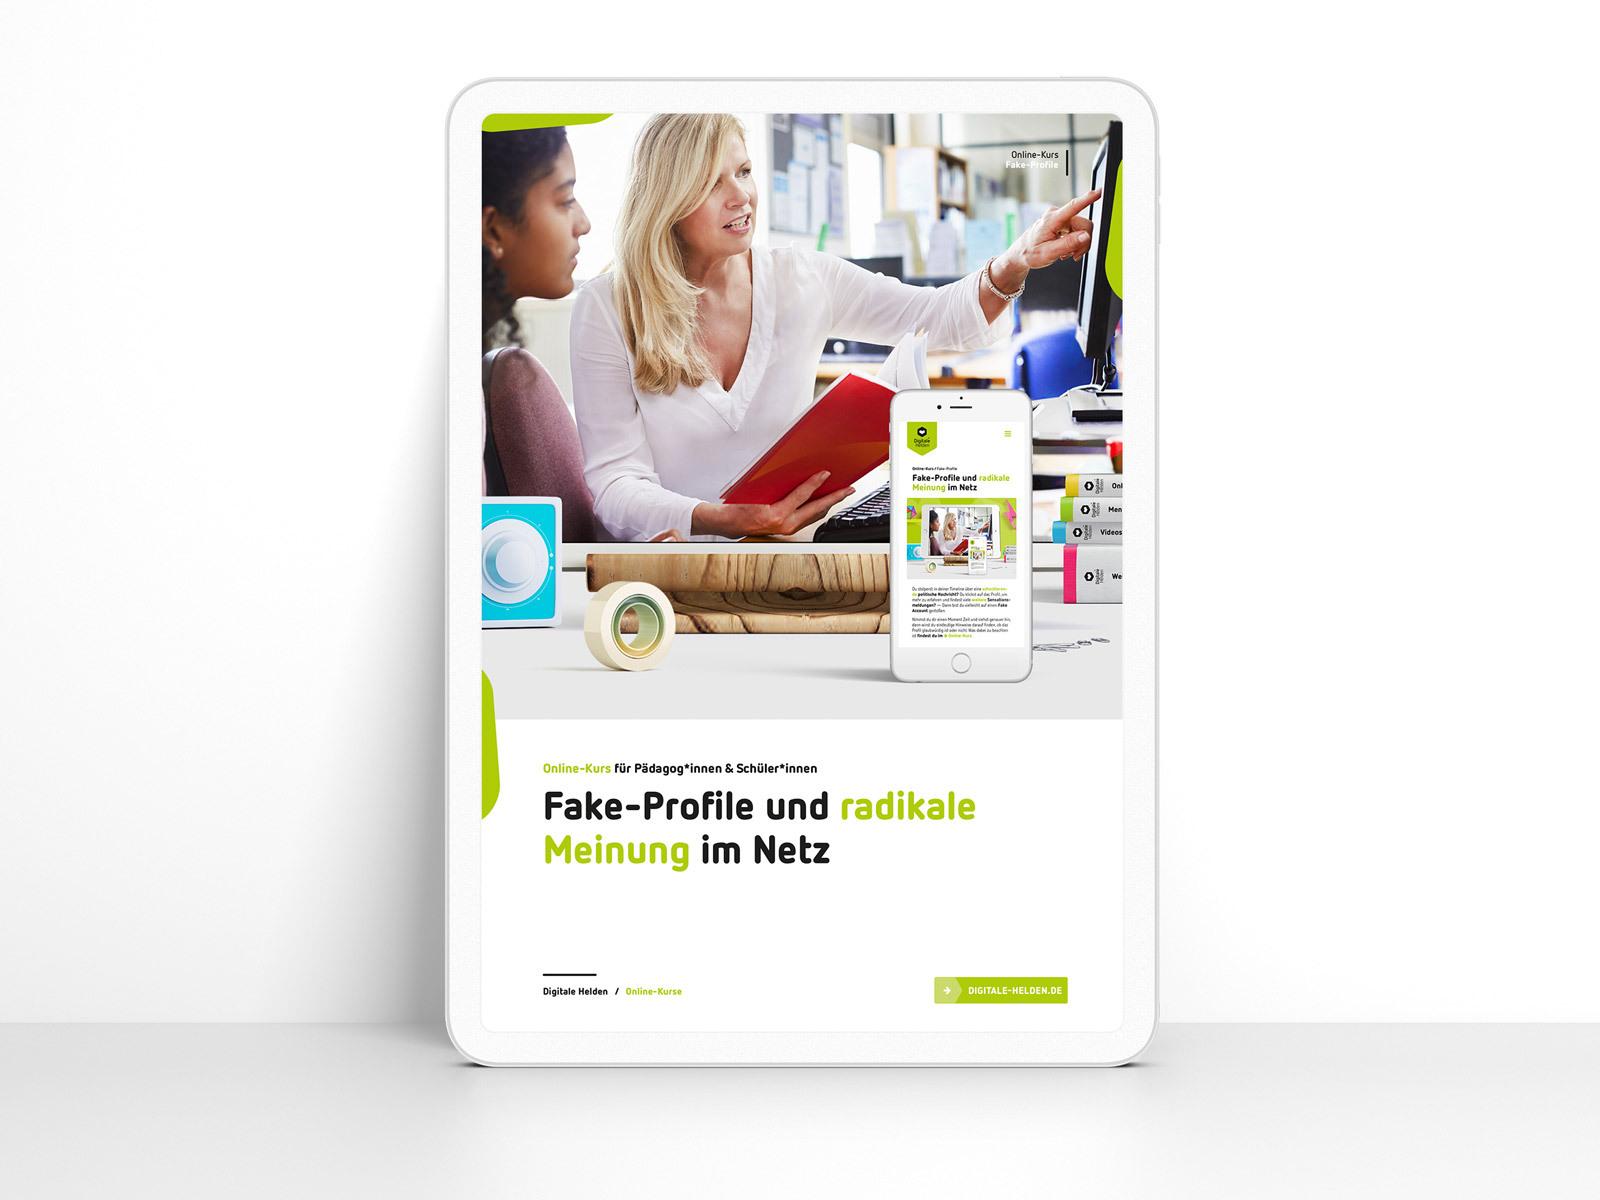 201130-Visual-Kurs-Fake-Profile